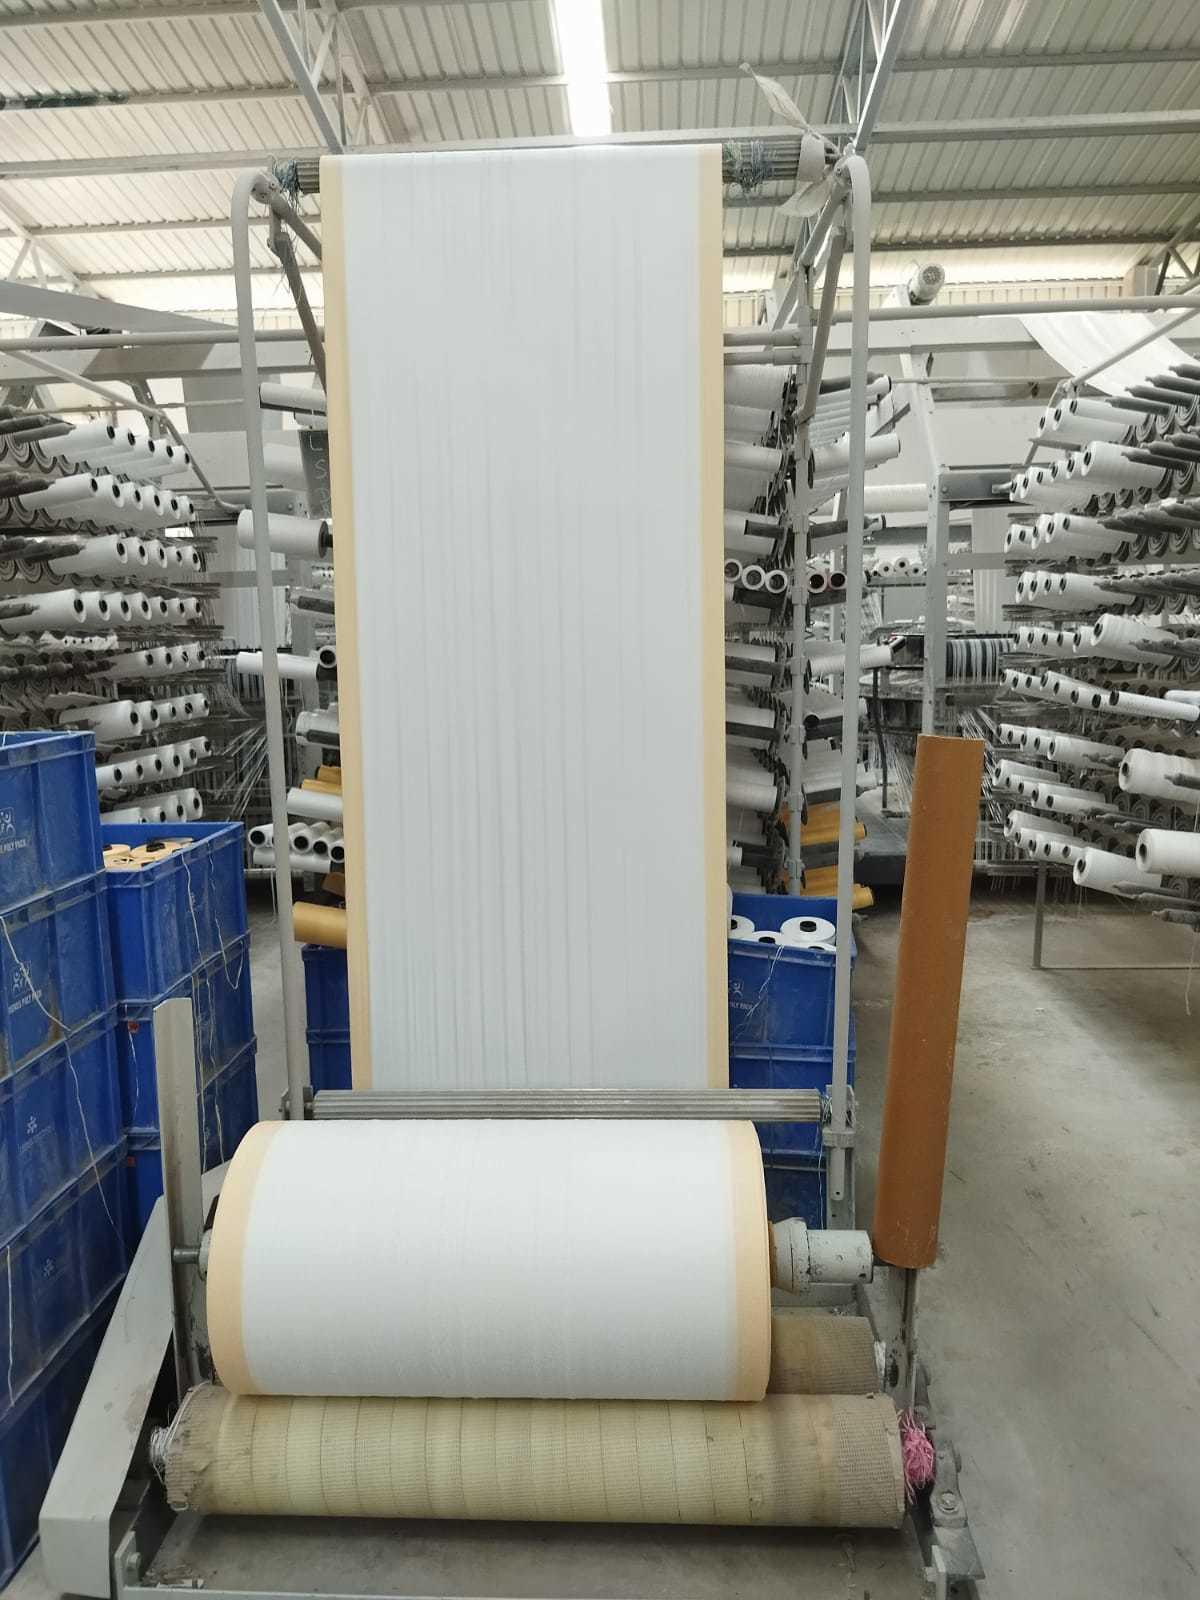 PP Woven Fabric Rolls